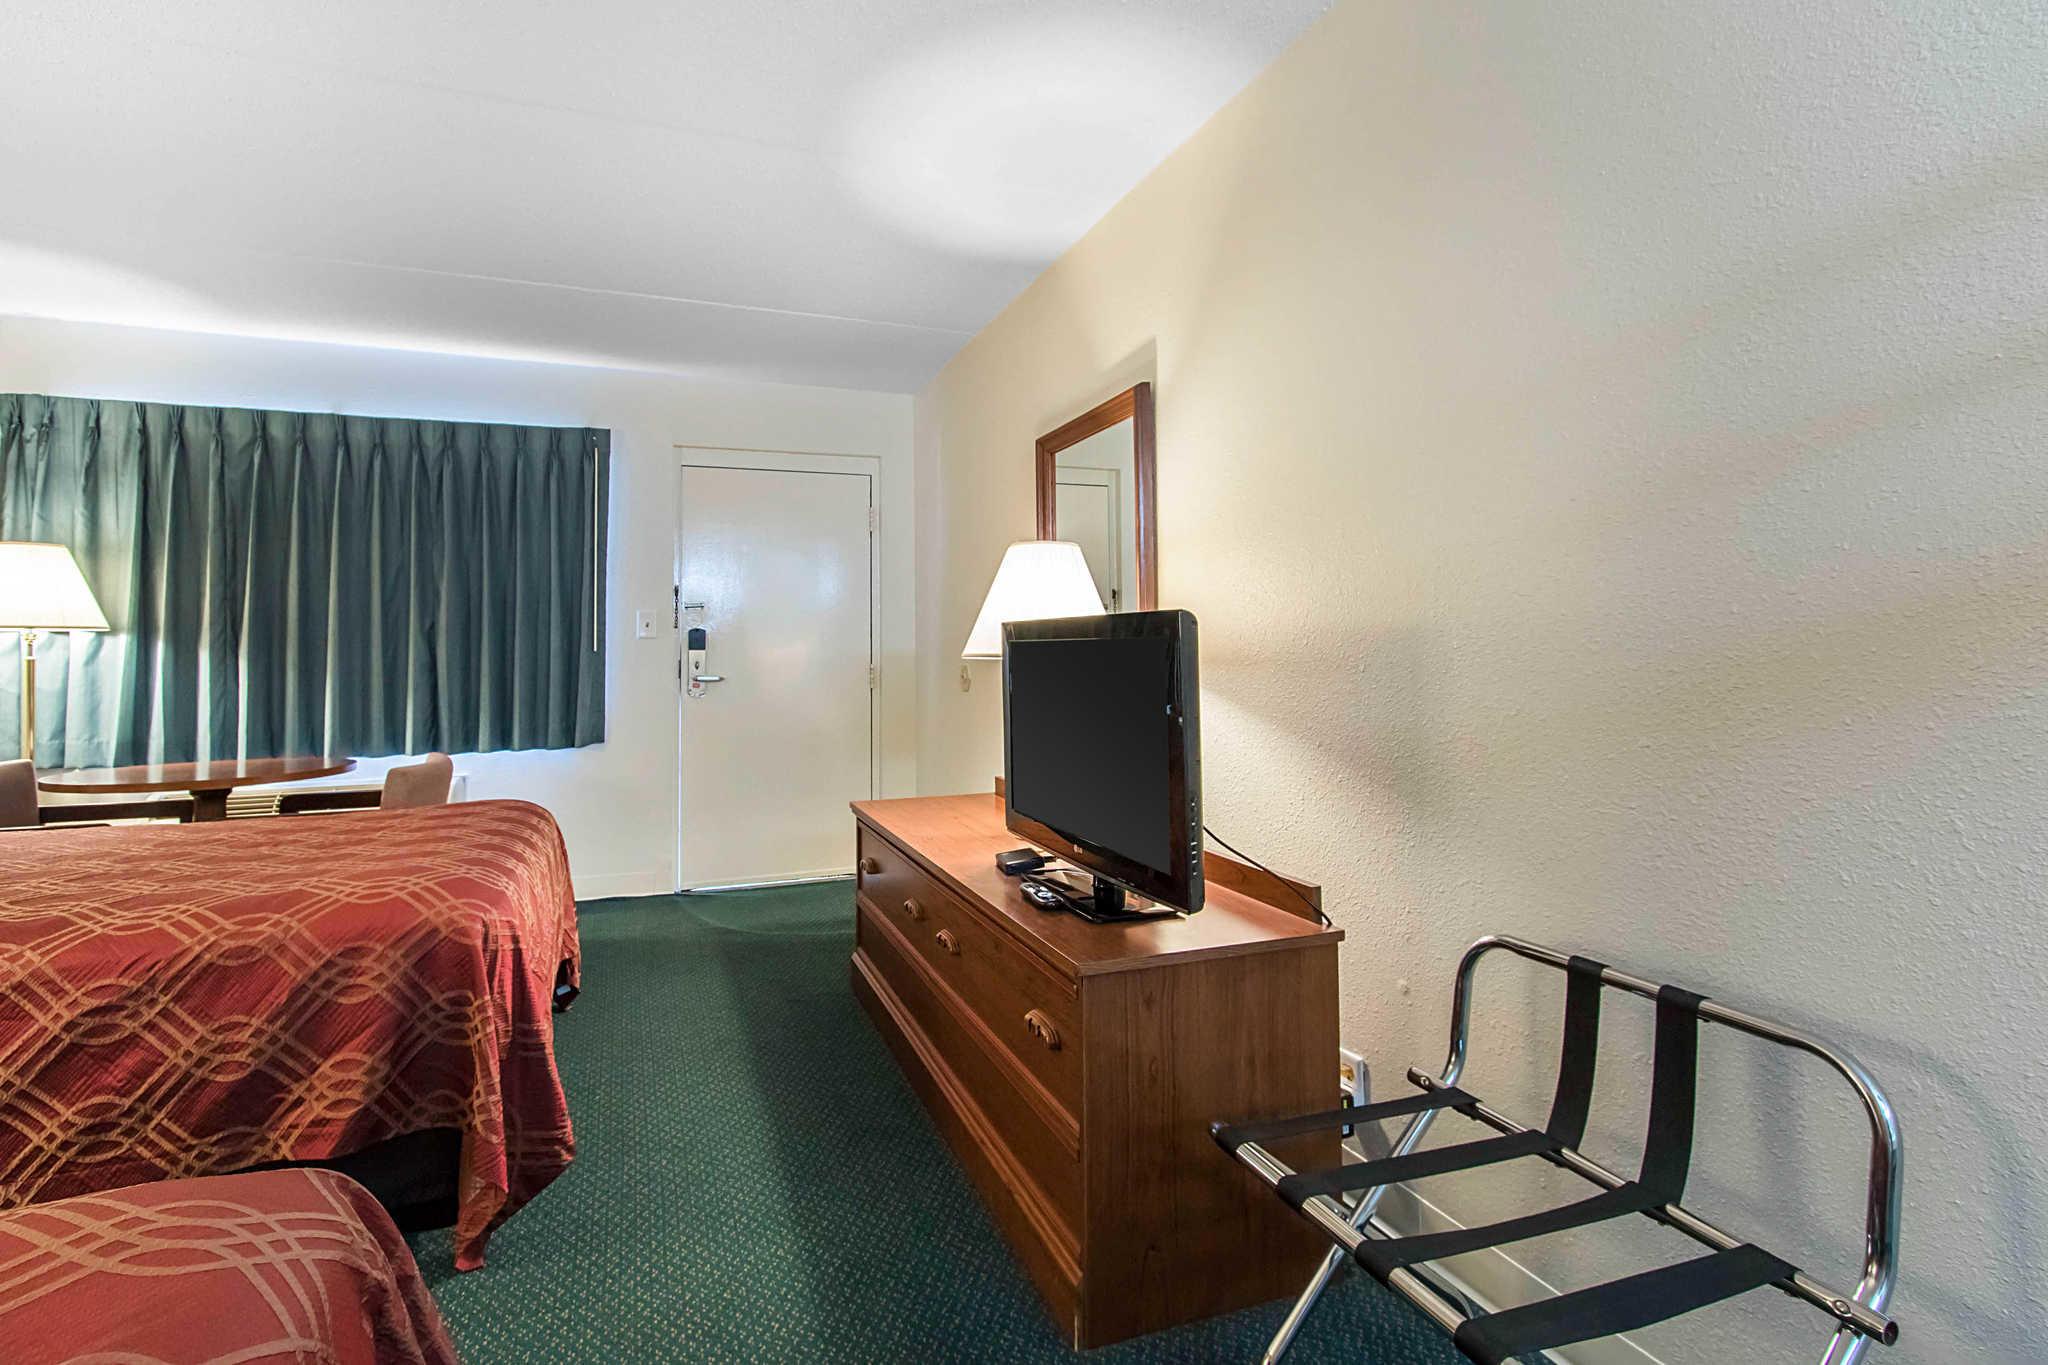 econo lodge in crestview fl 32536. Black Bedroom Furniture Sets. Home Design Ideas